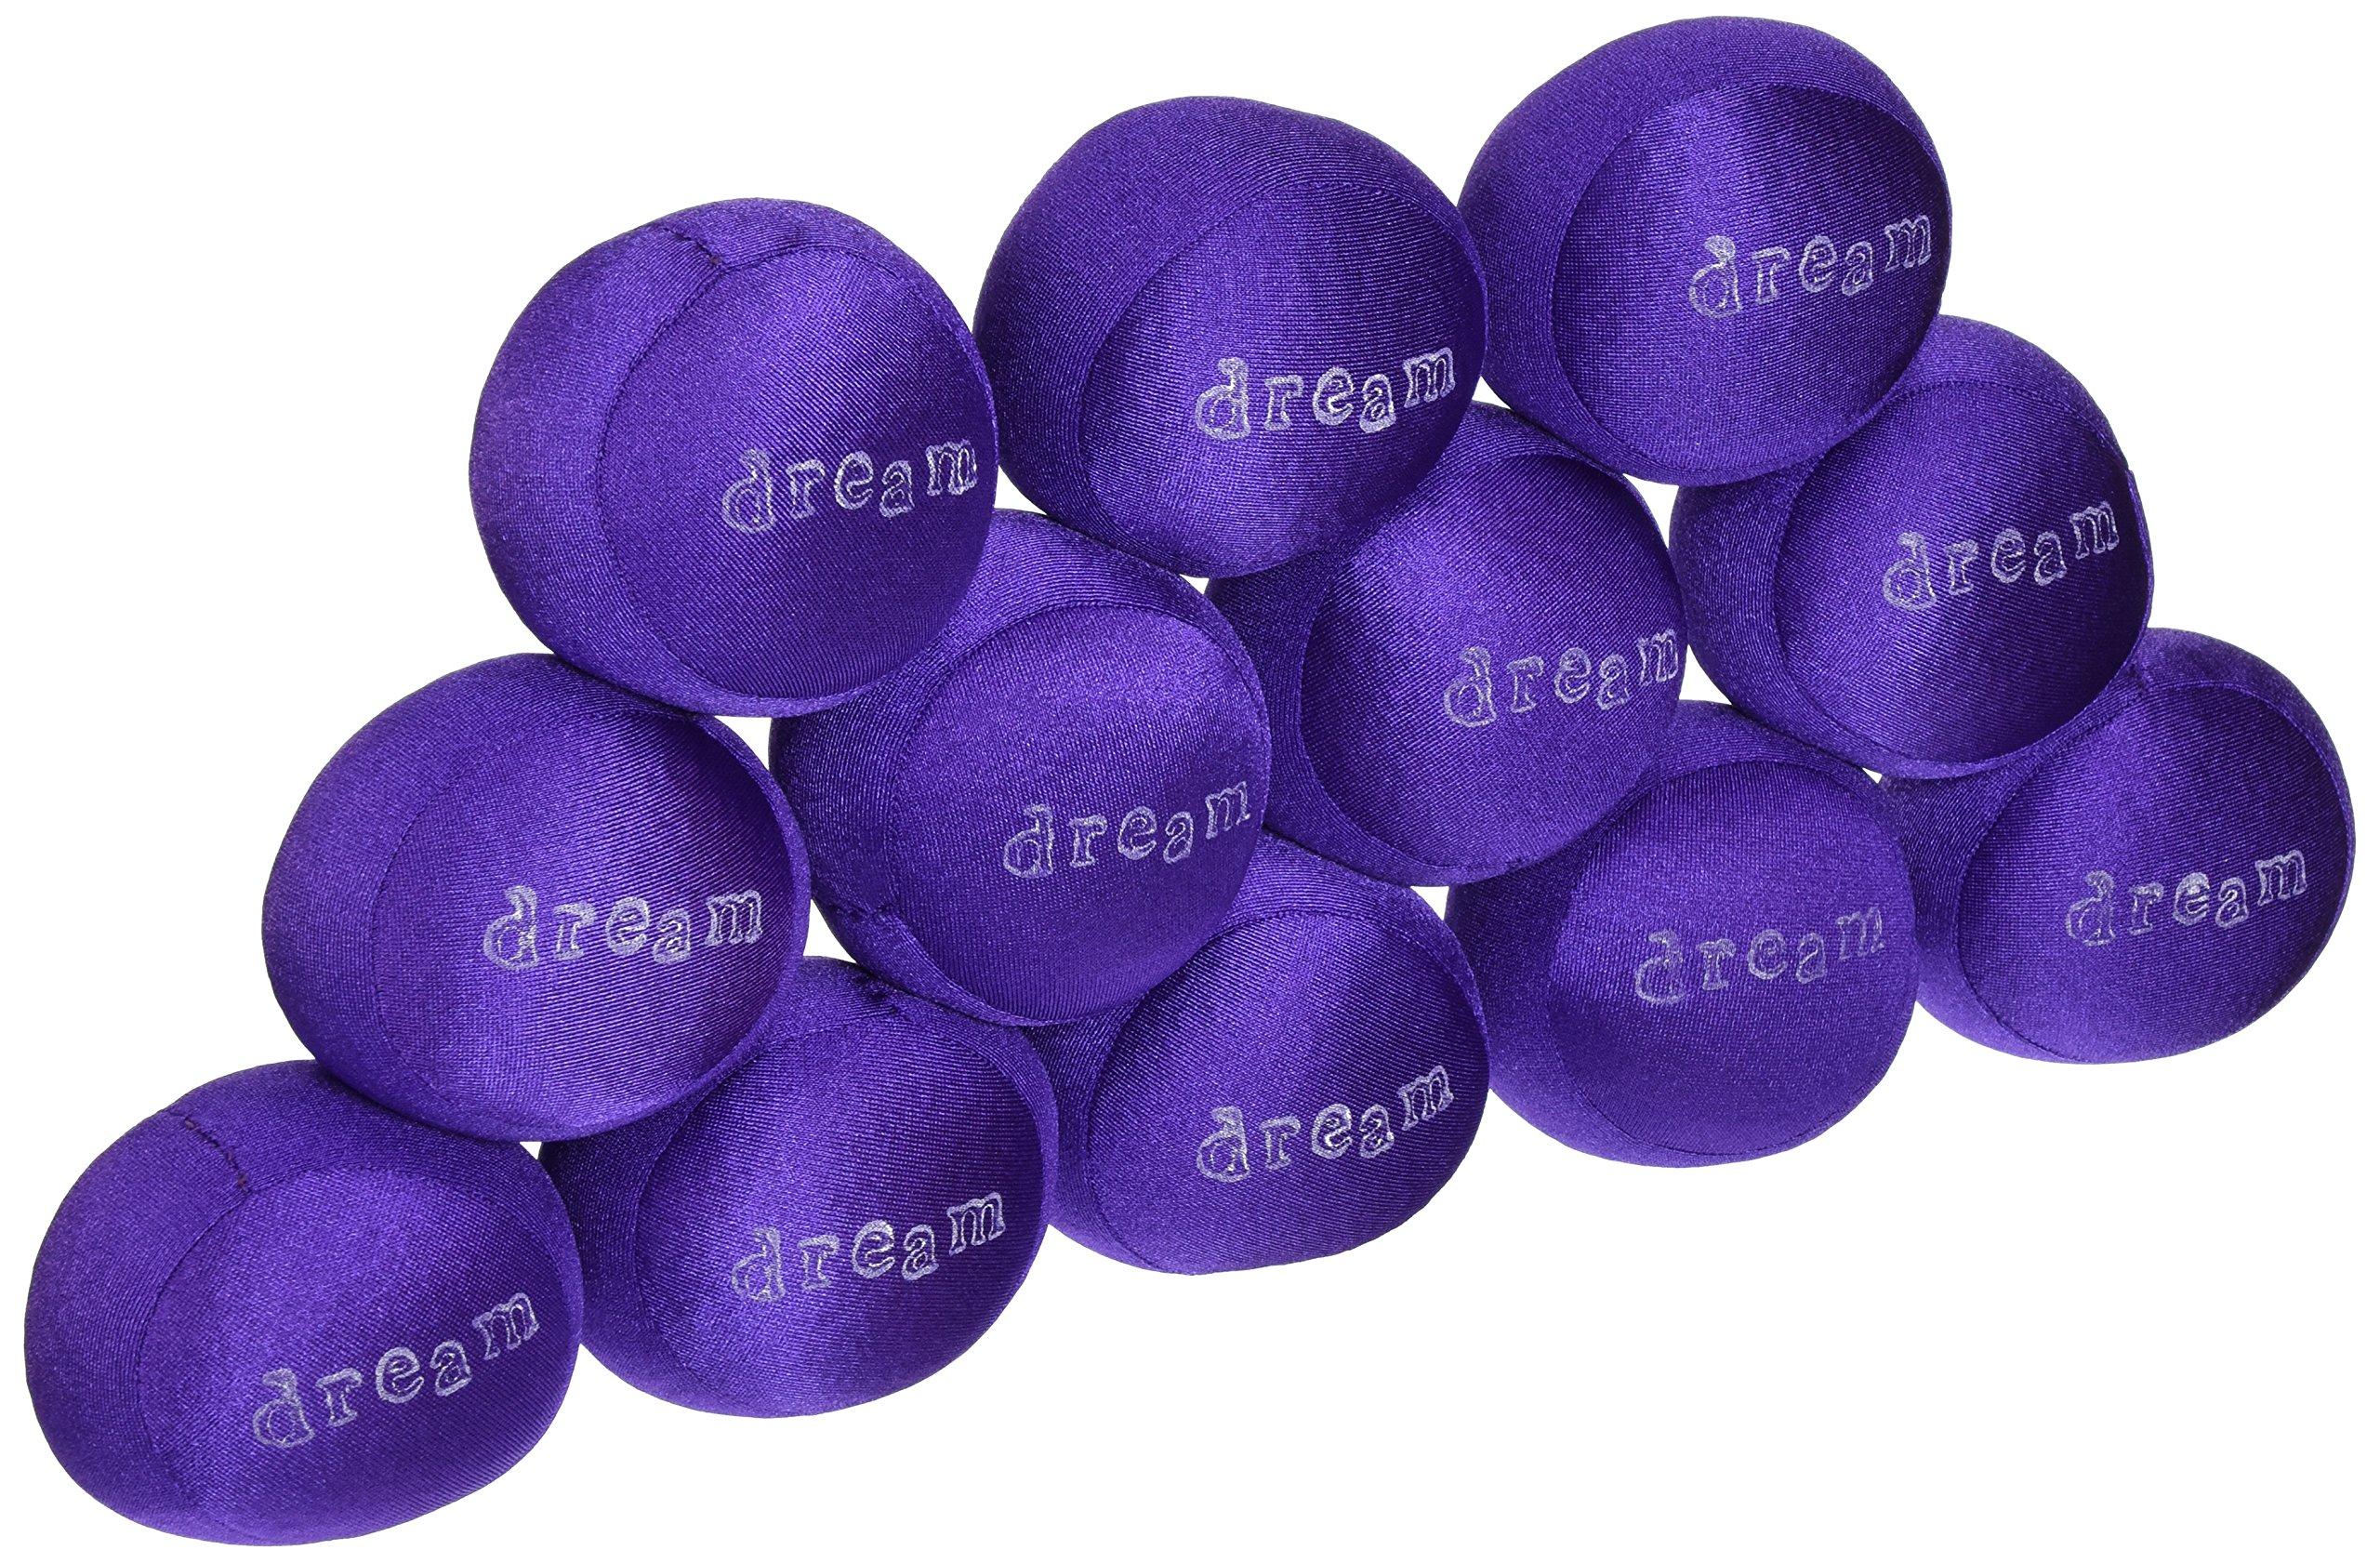 Lavender Luvies Lavender Stress Balls, Purple Dream - 12 Pack